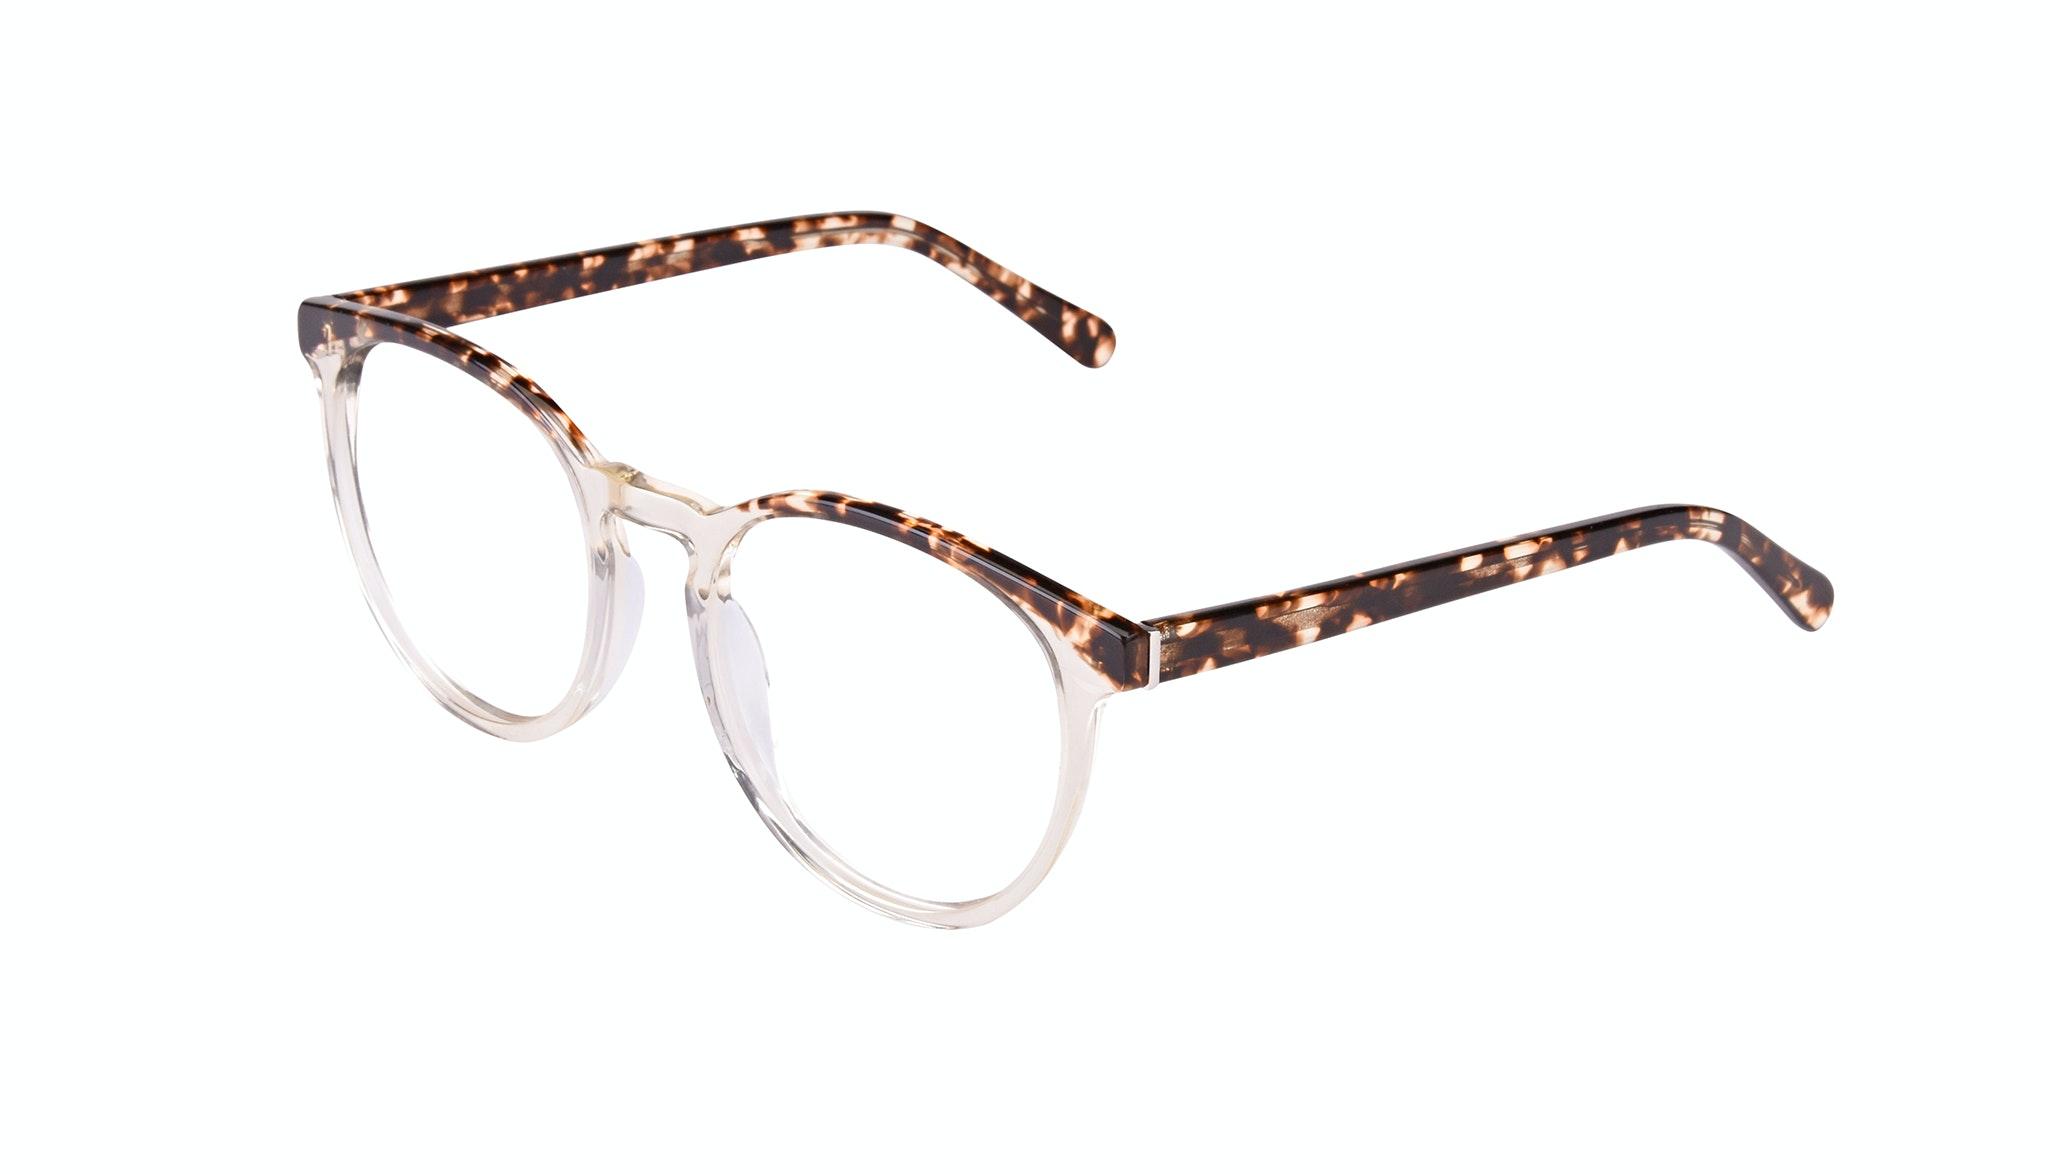 Affordable Fashion Glasses Round Eyeglasses Women Brilliant Blond Tortoise Tilt